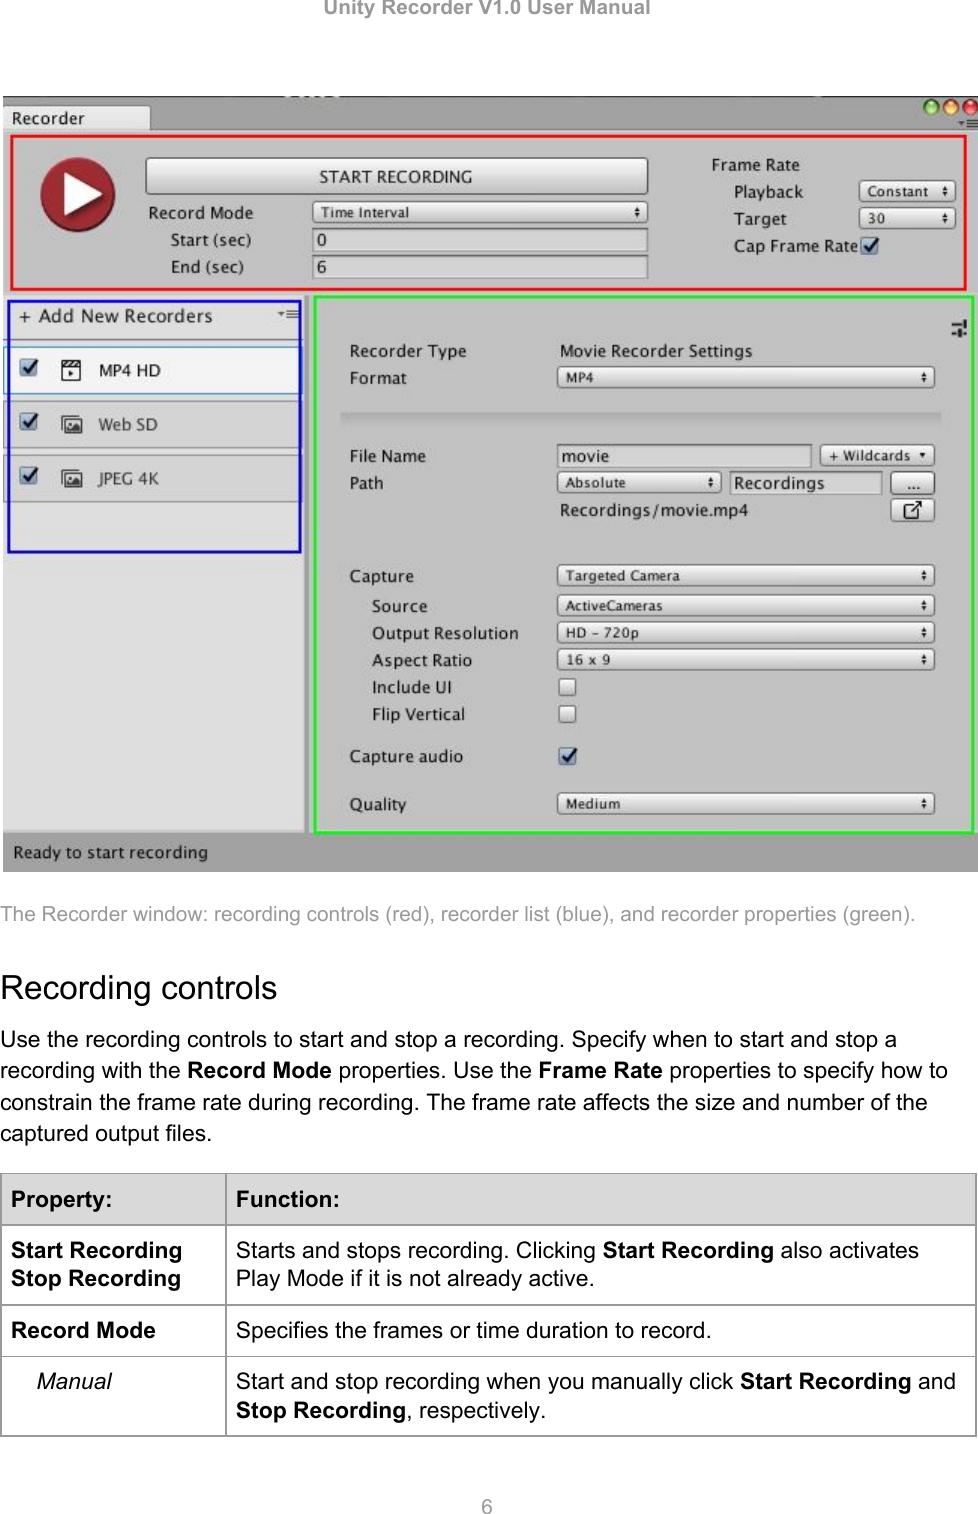 Unity Recorder V1User Manual